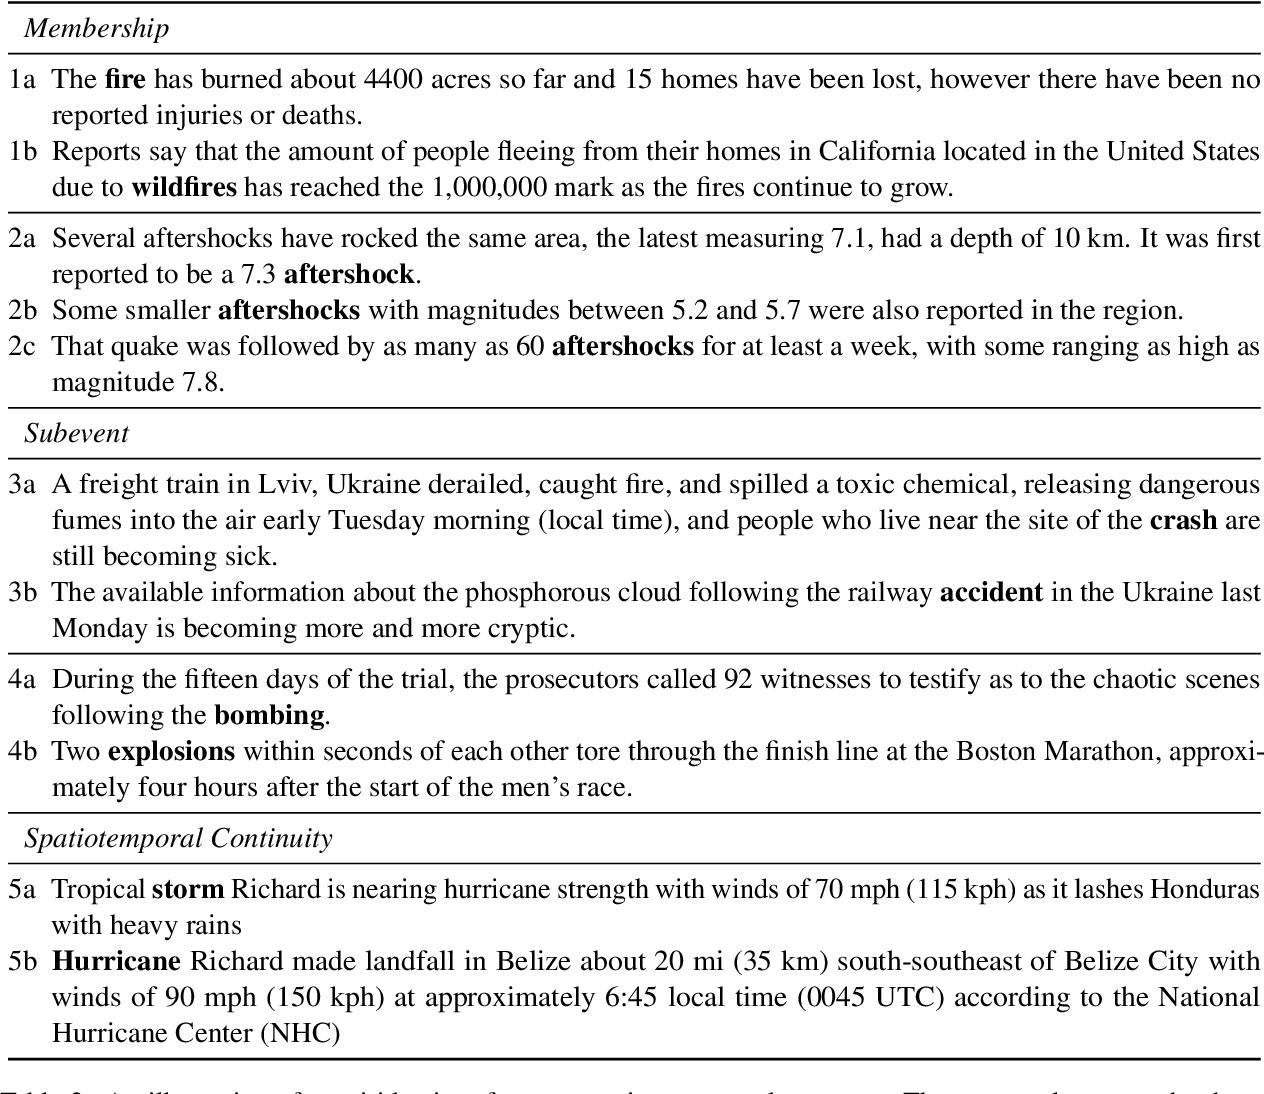 Figure 4 for Cross-document Event Identity via Dense Annotation